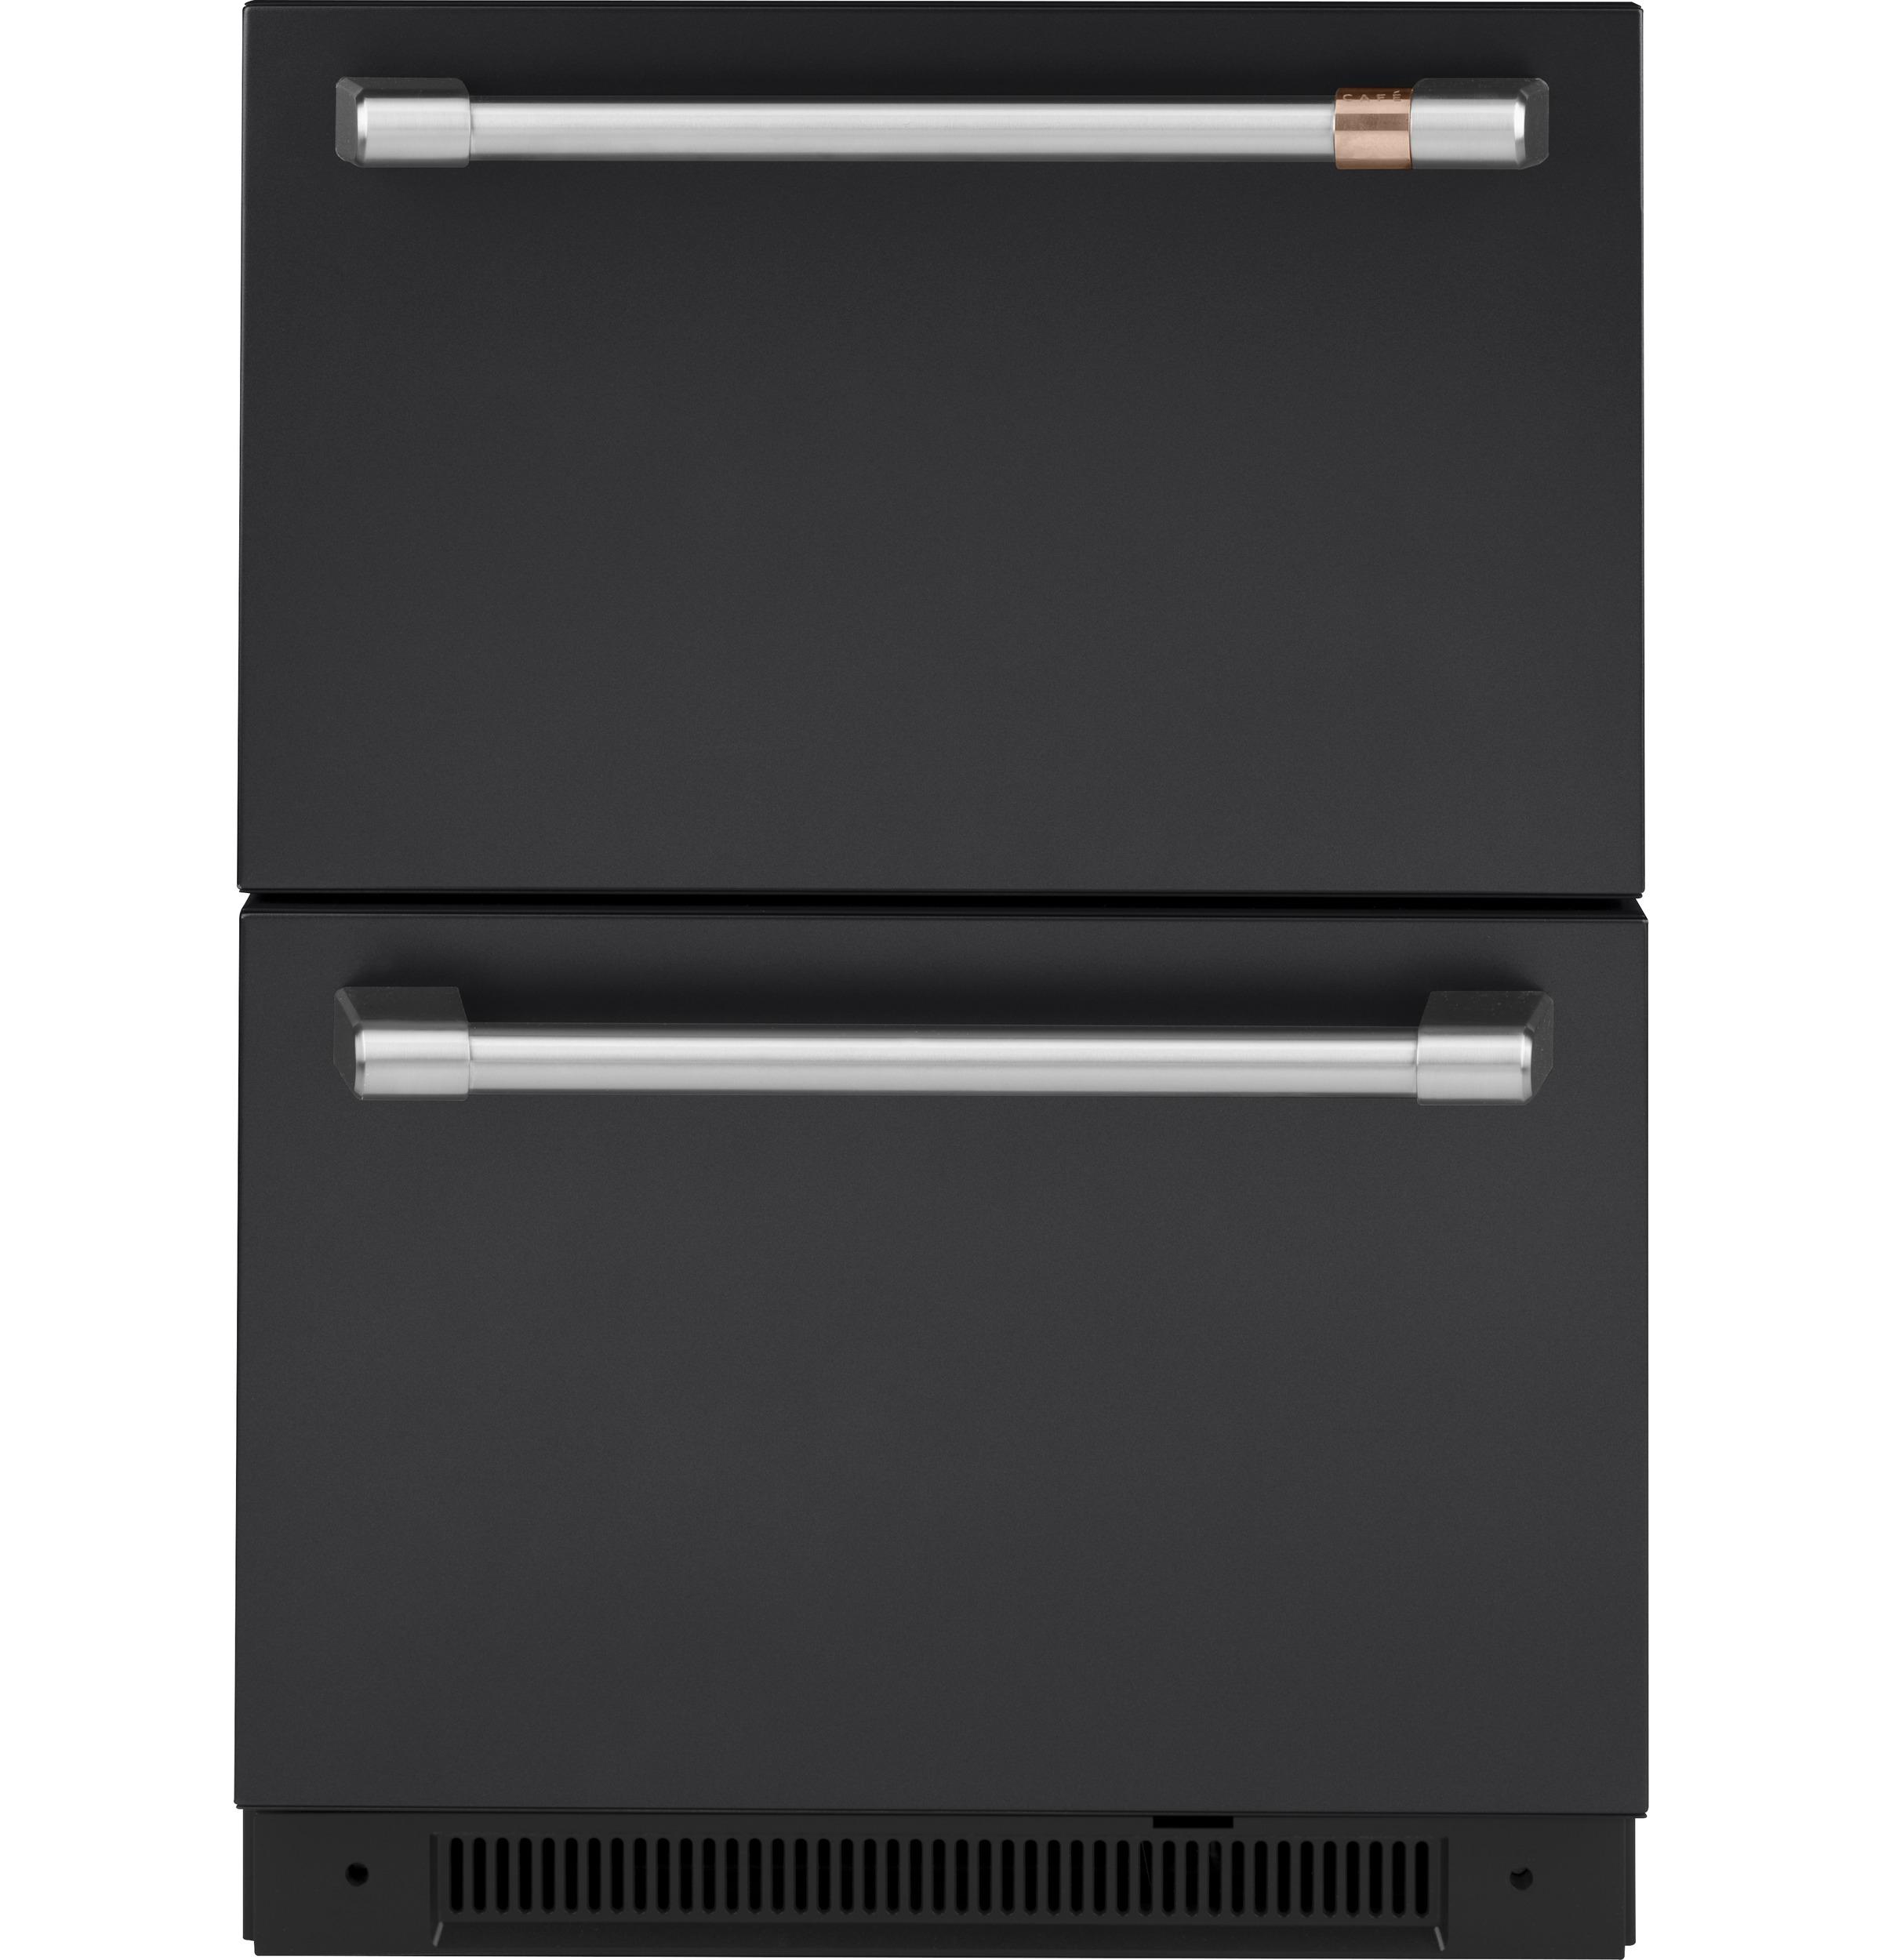 Model: CDE06RP3ND1 | Café™ 5.7 Cu. Ft. Built-In Dual-Drawer Refrigerator